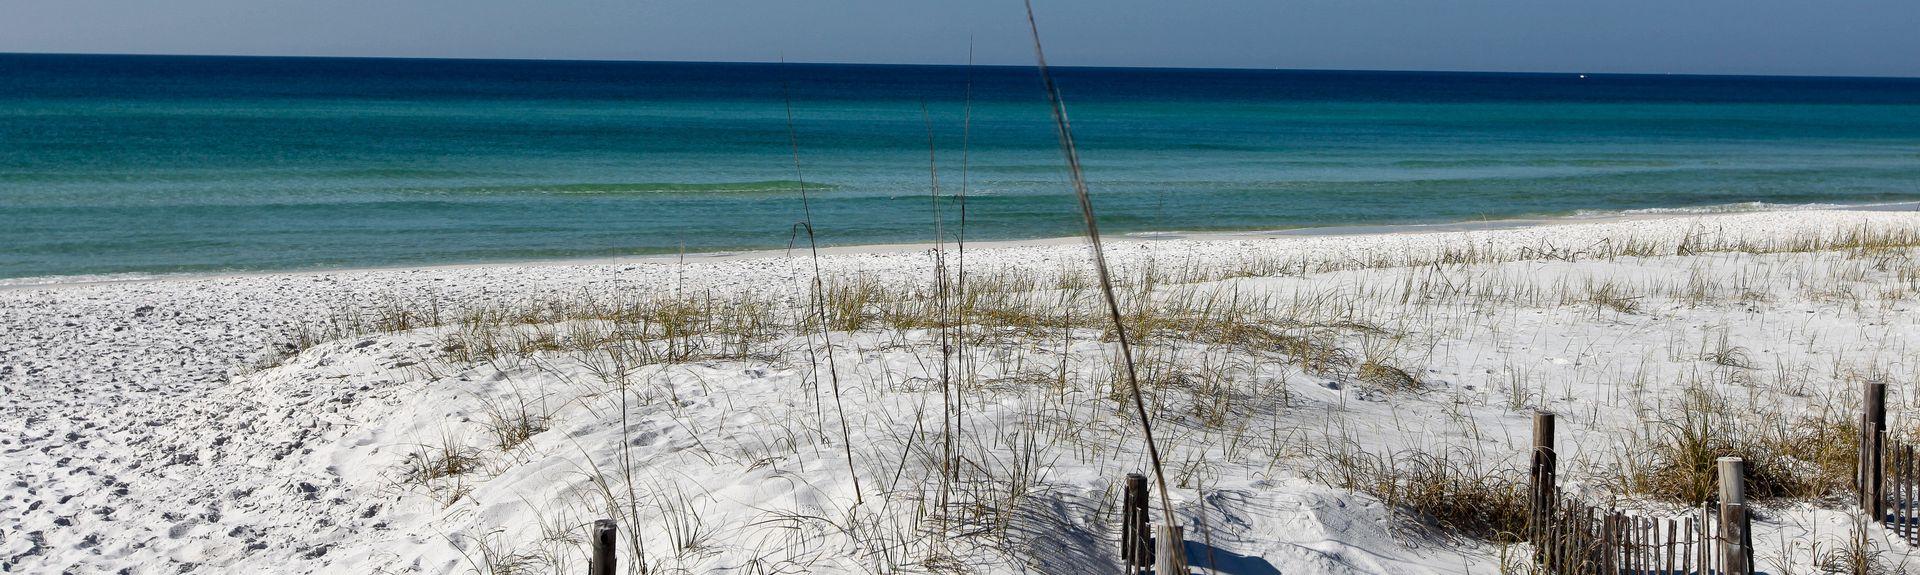 Leeward Key (Miramar Beach, Florida, United States)